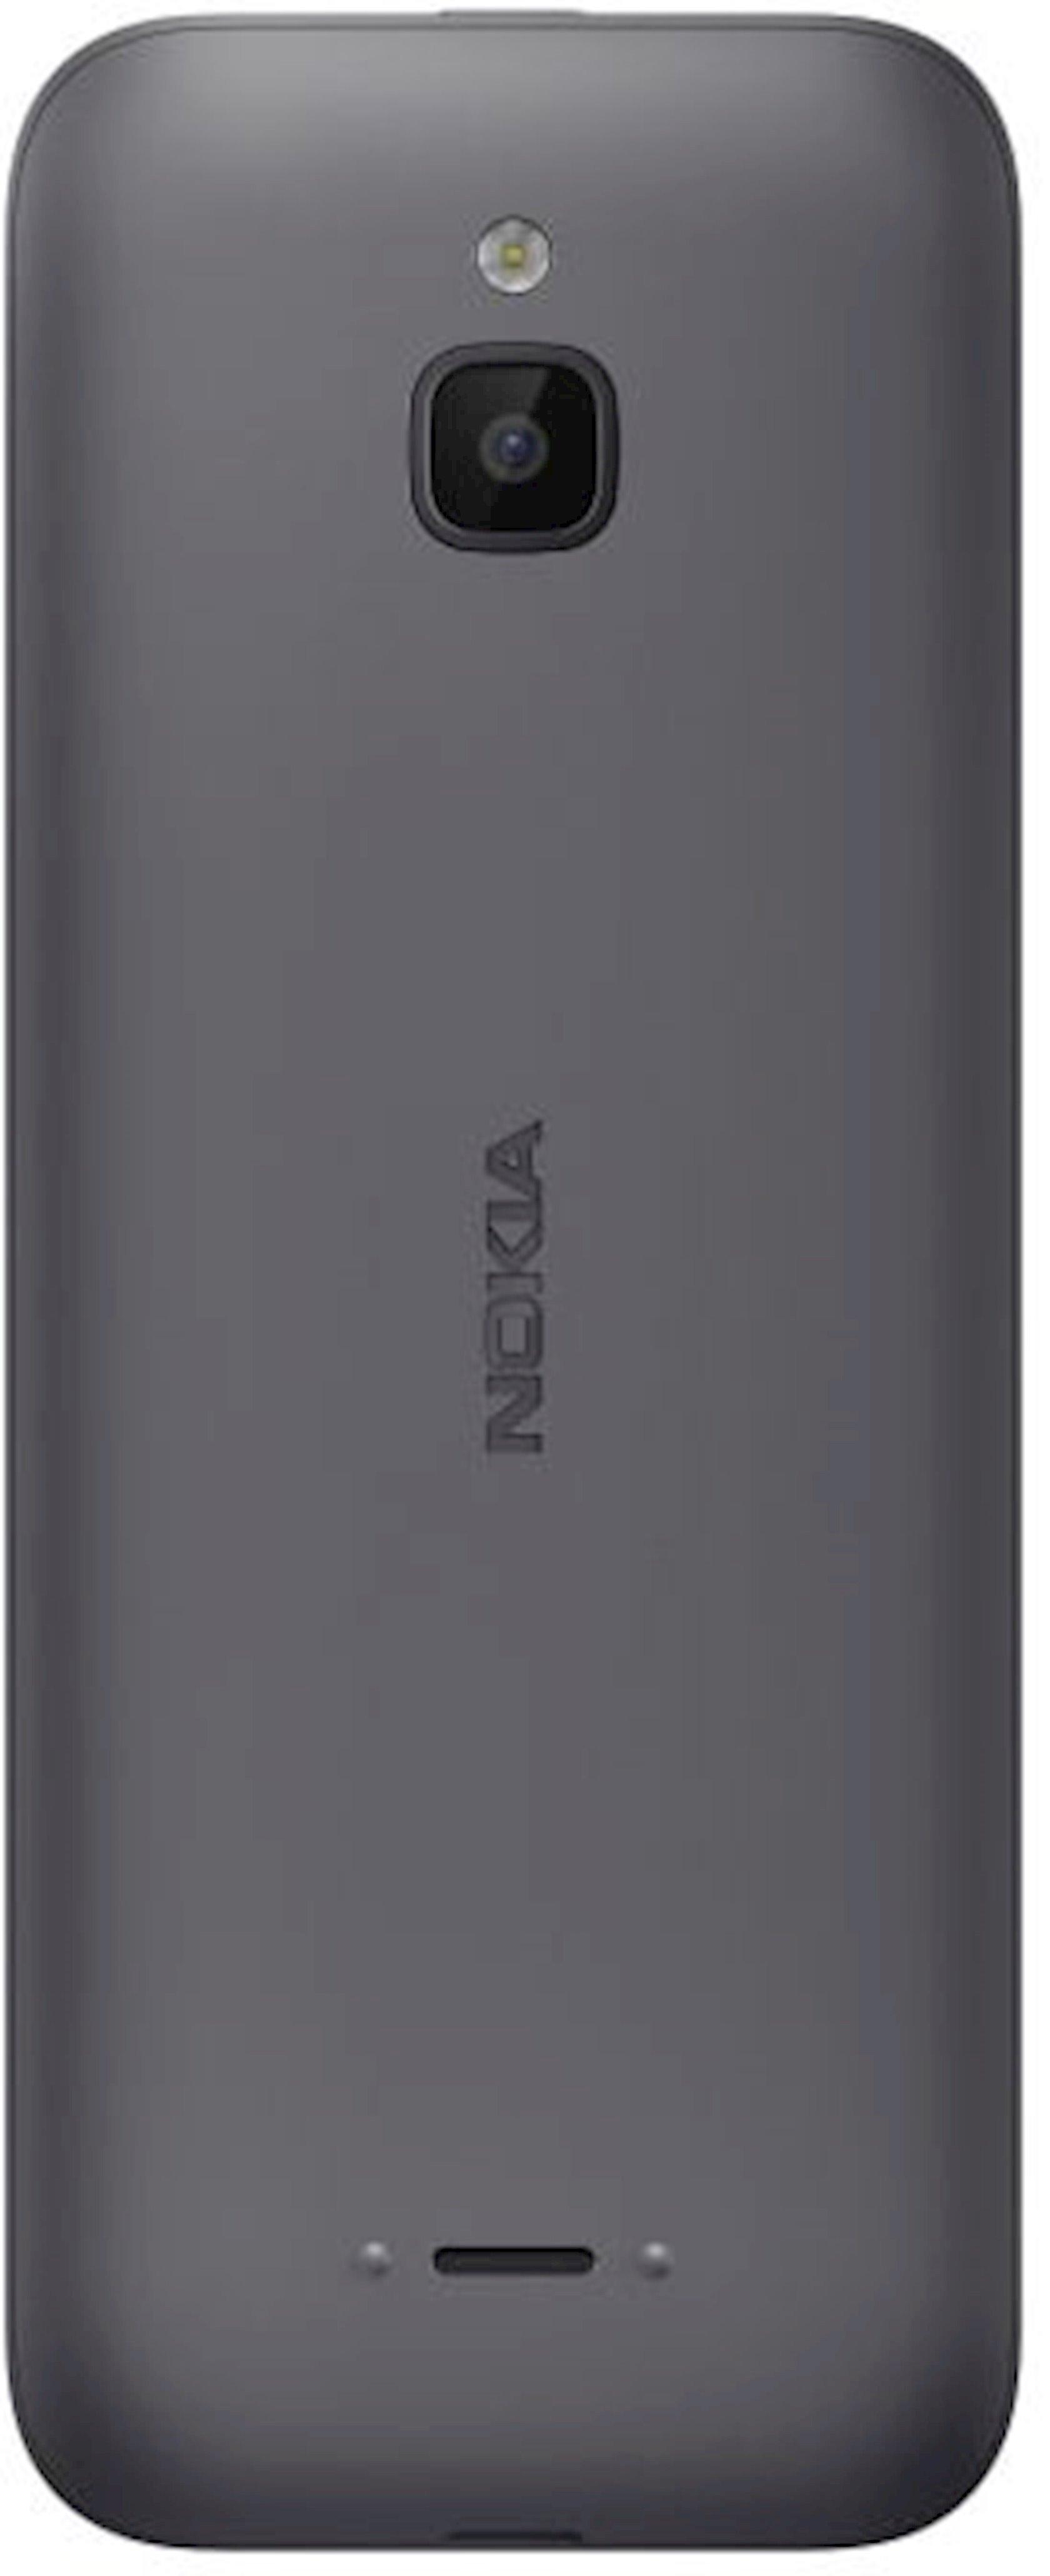 Mobil telefon Nokia 6300 DS 4G Charcoal